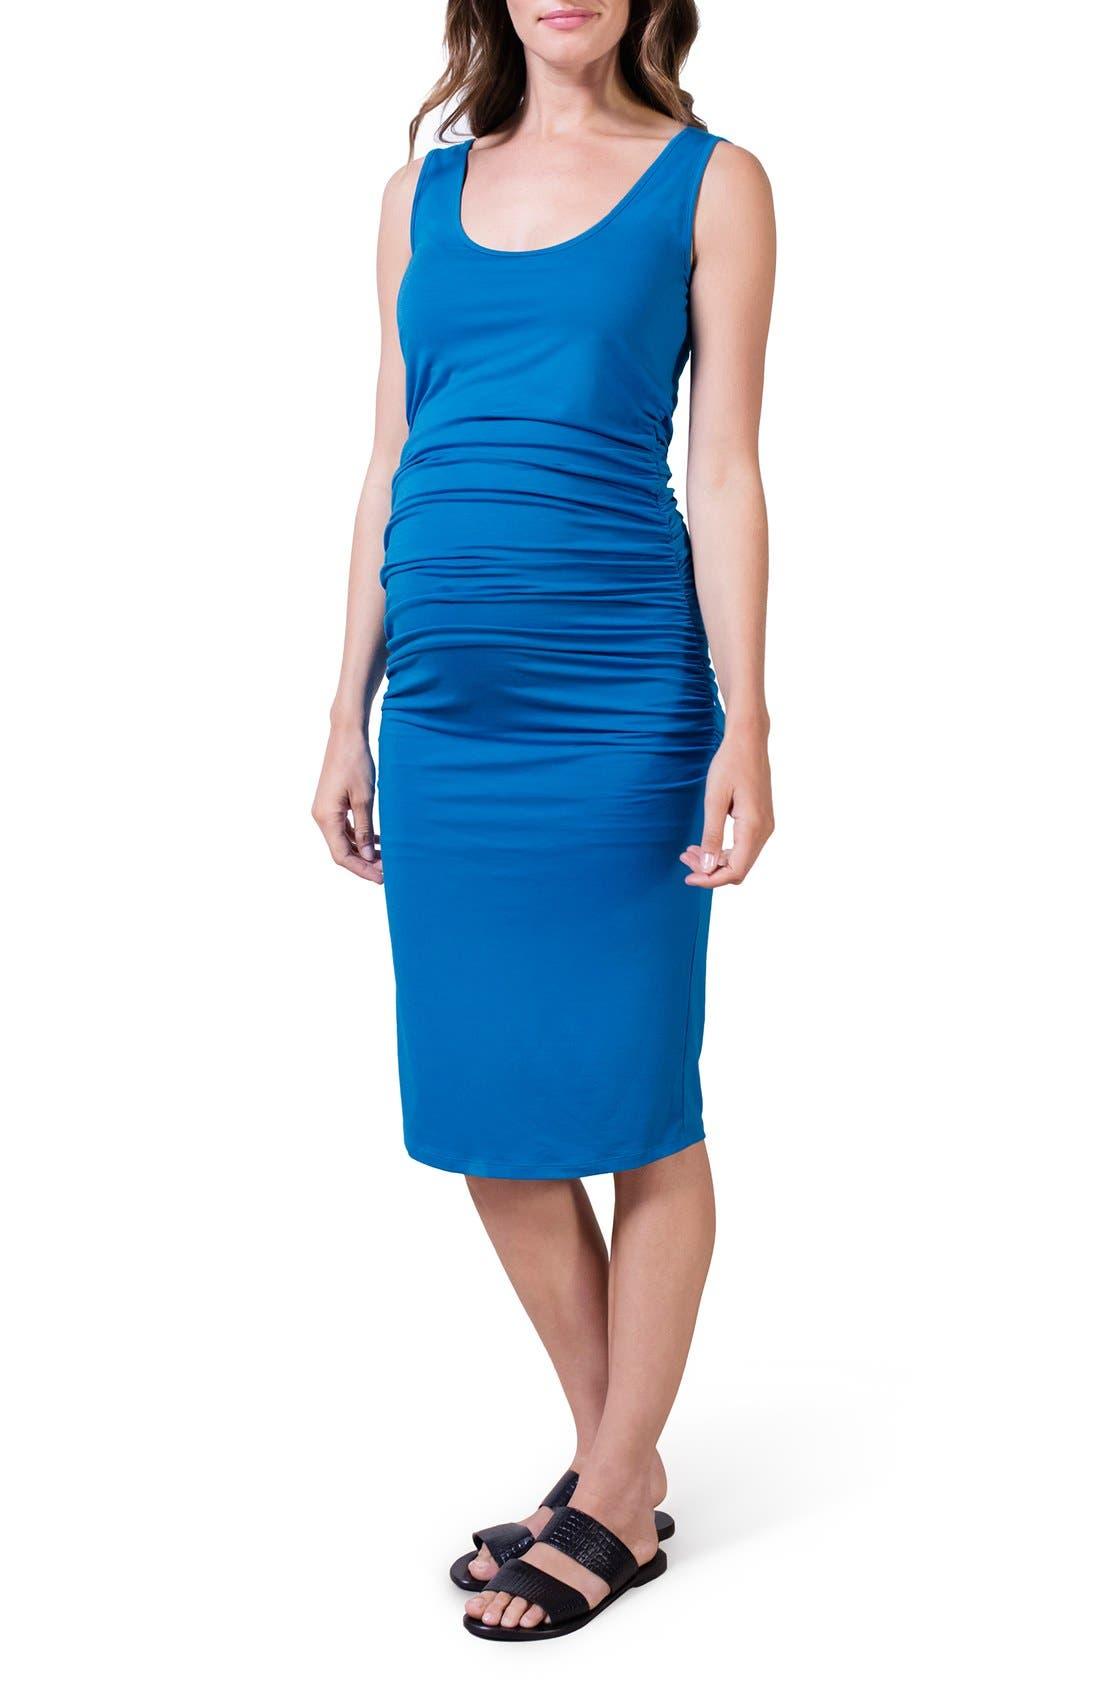 ISABELLA OLIVER,                             'Ellis' Maternity Tank Dress,                             Main thumbnail 1, color,                             PEACOCK BLUE